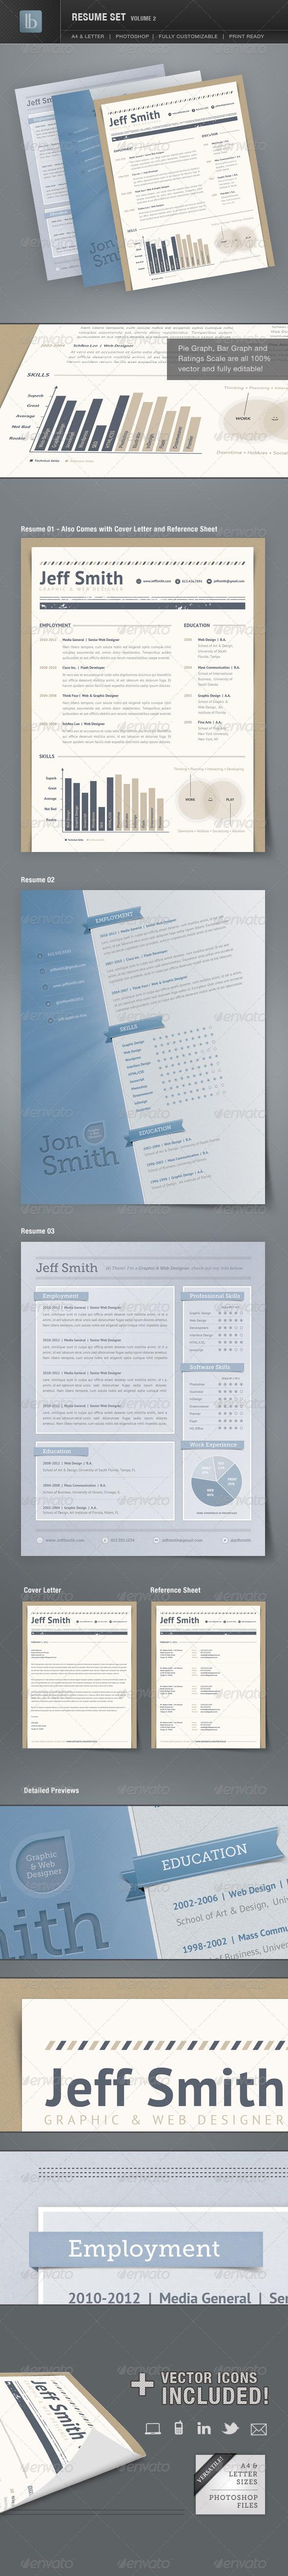 GraphicRiver Resume Set Volume 2 1479087